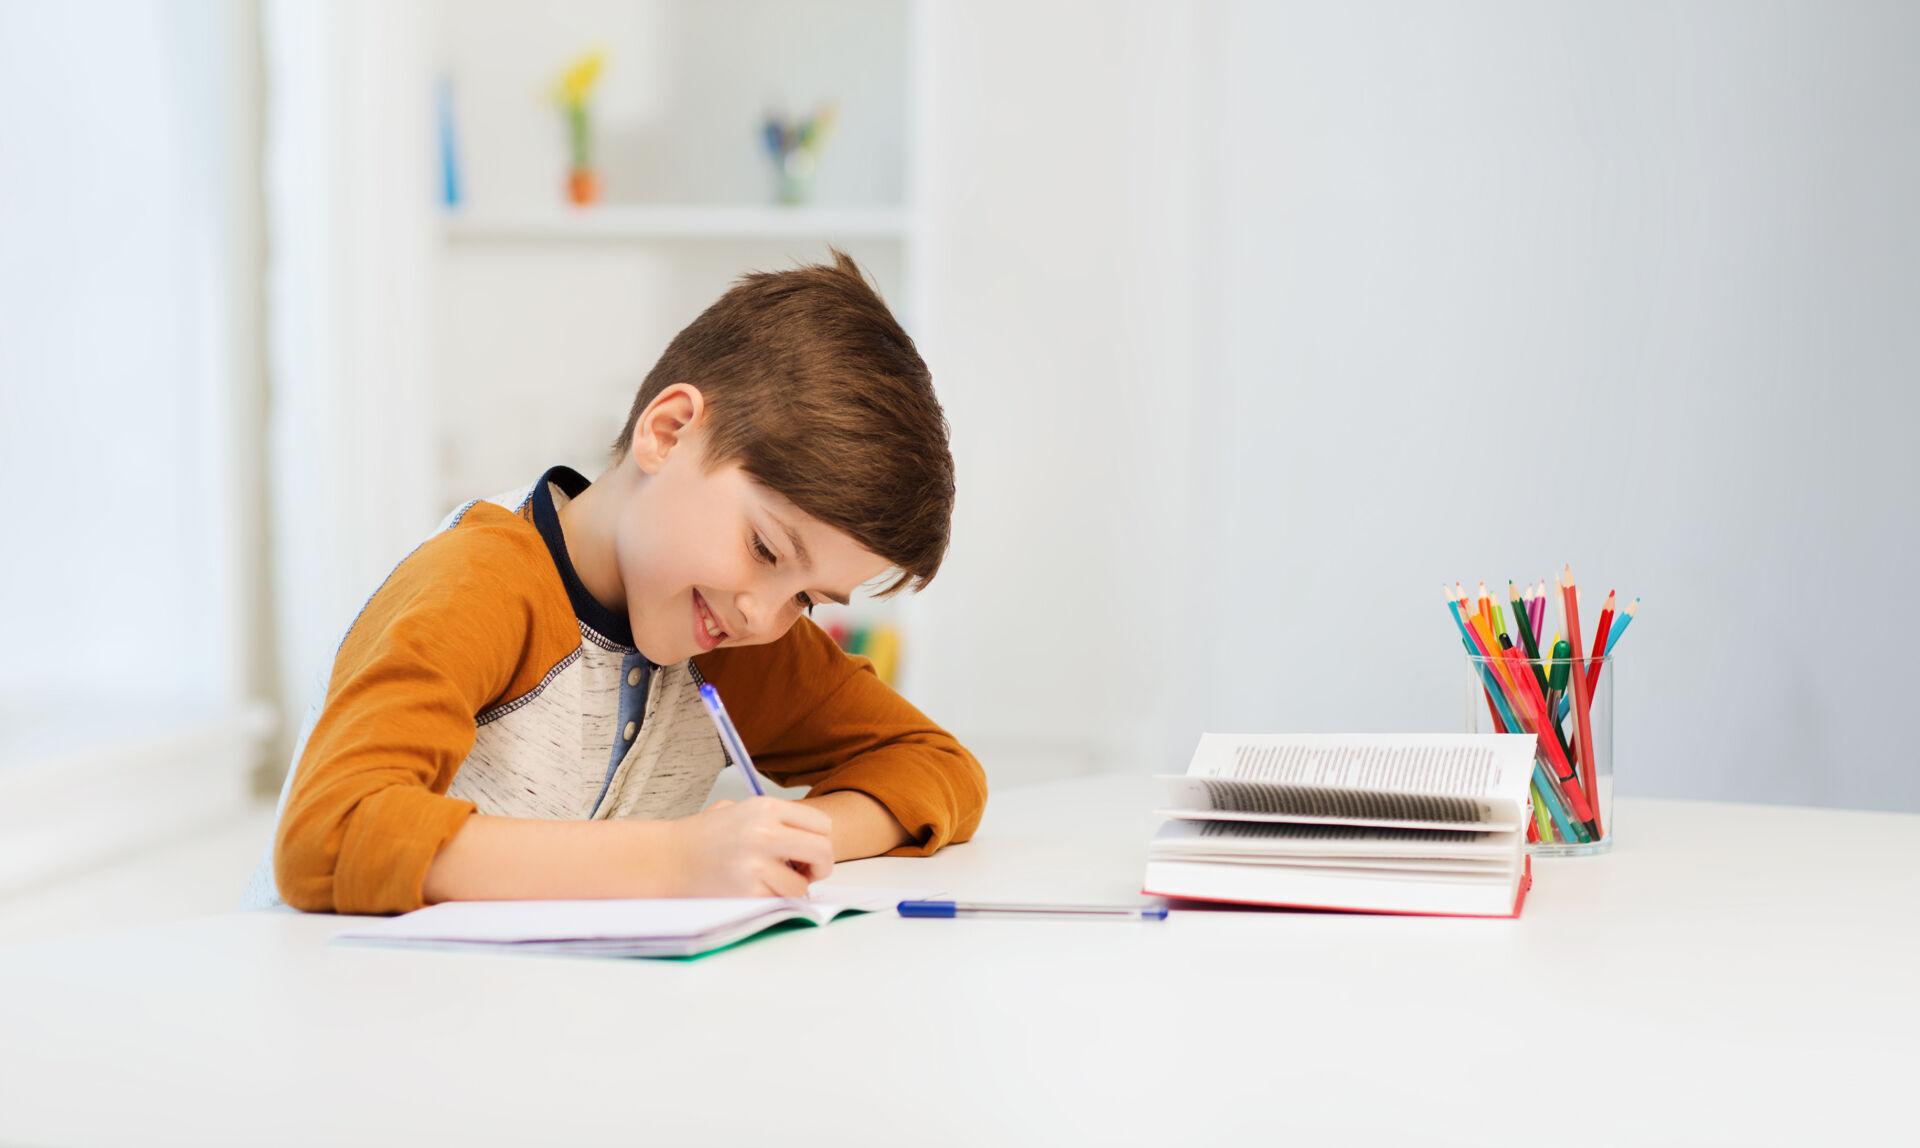 calgary home tutoring online marketing case study